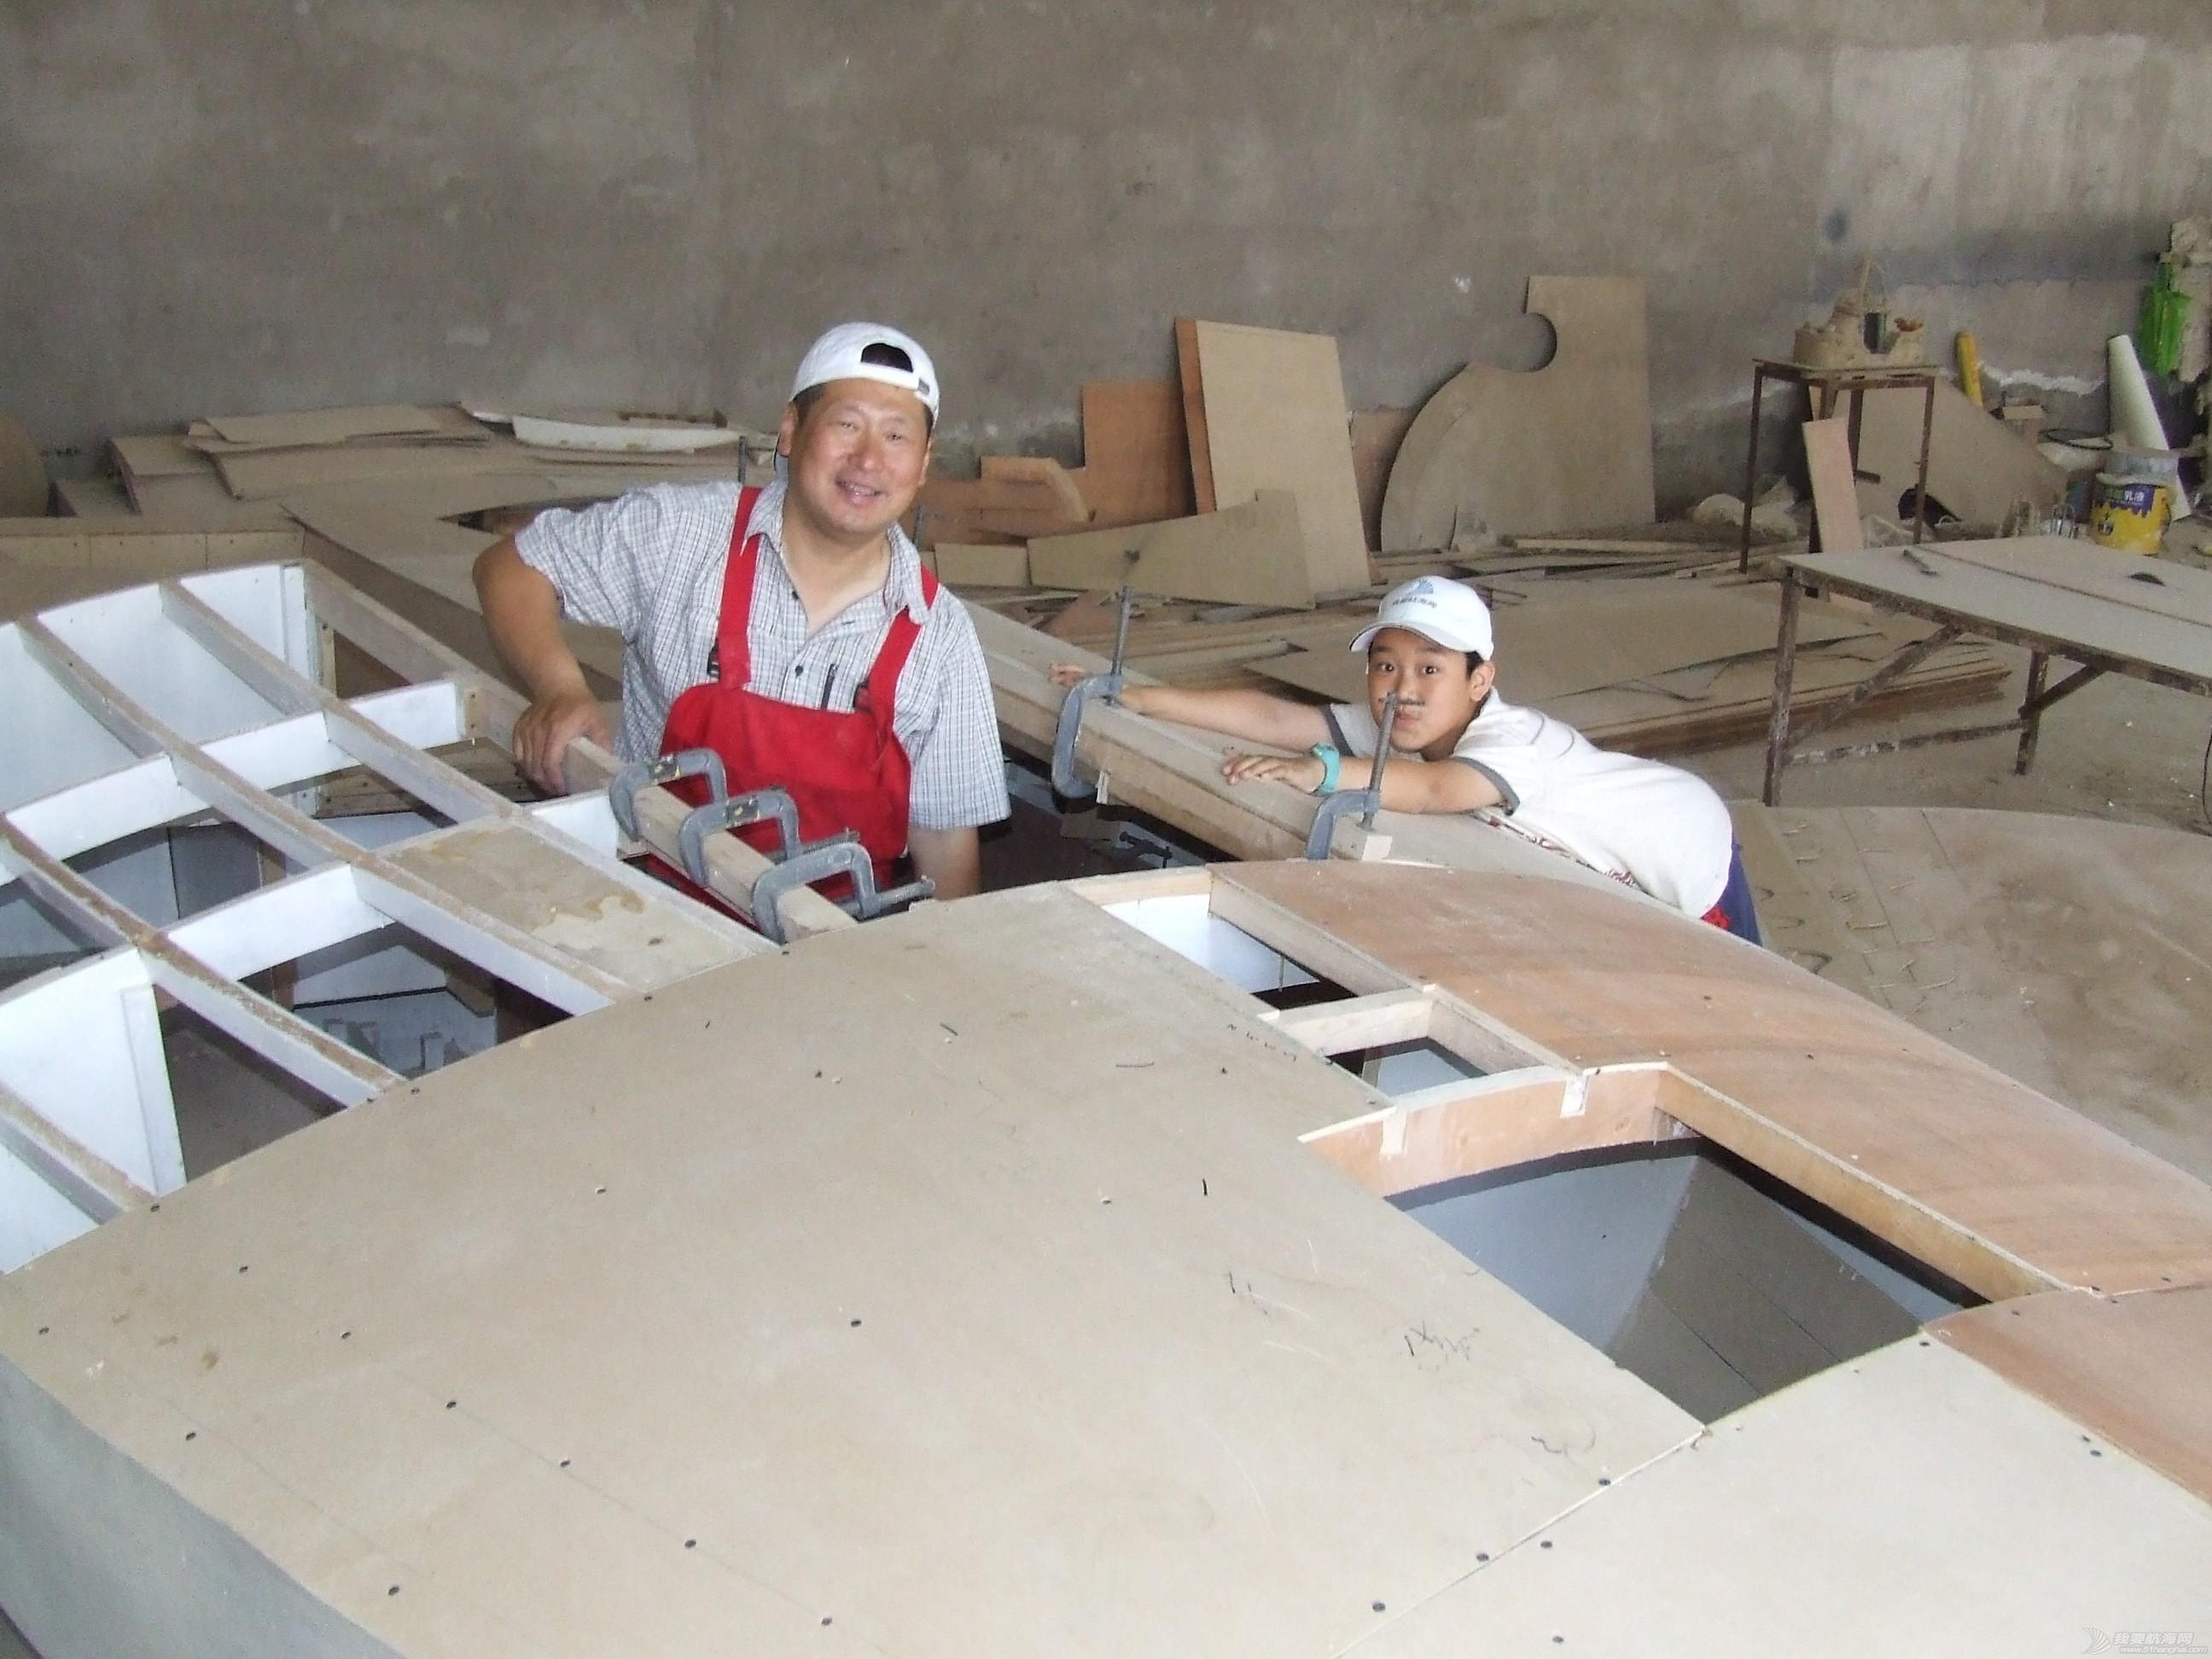 GR-750舱面面板铺装完毕 DSCF6075.JPG